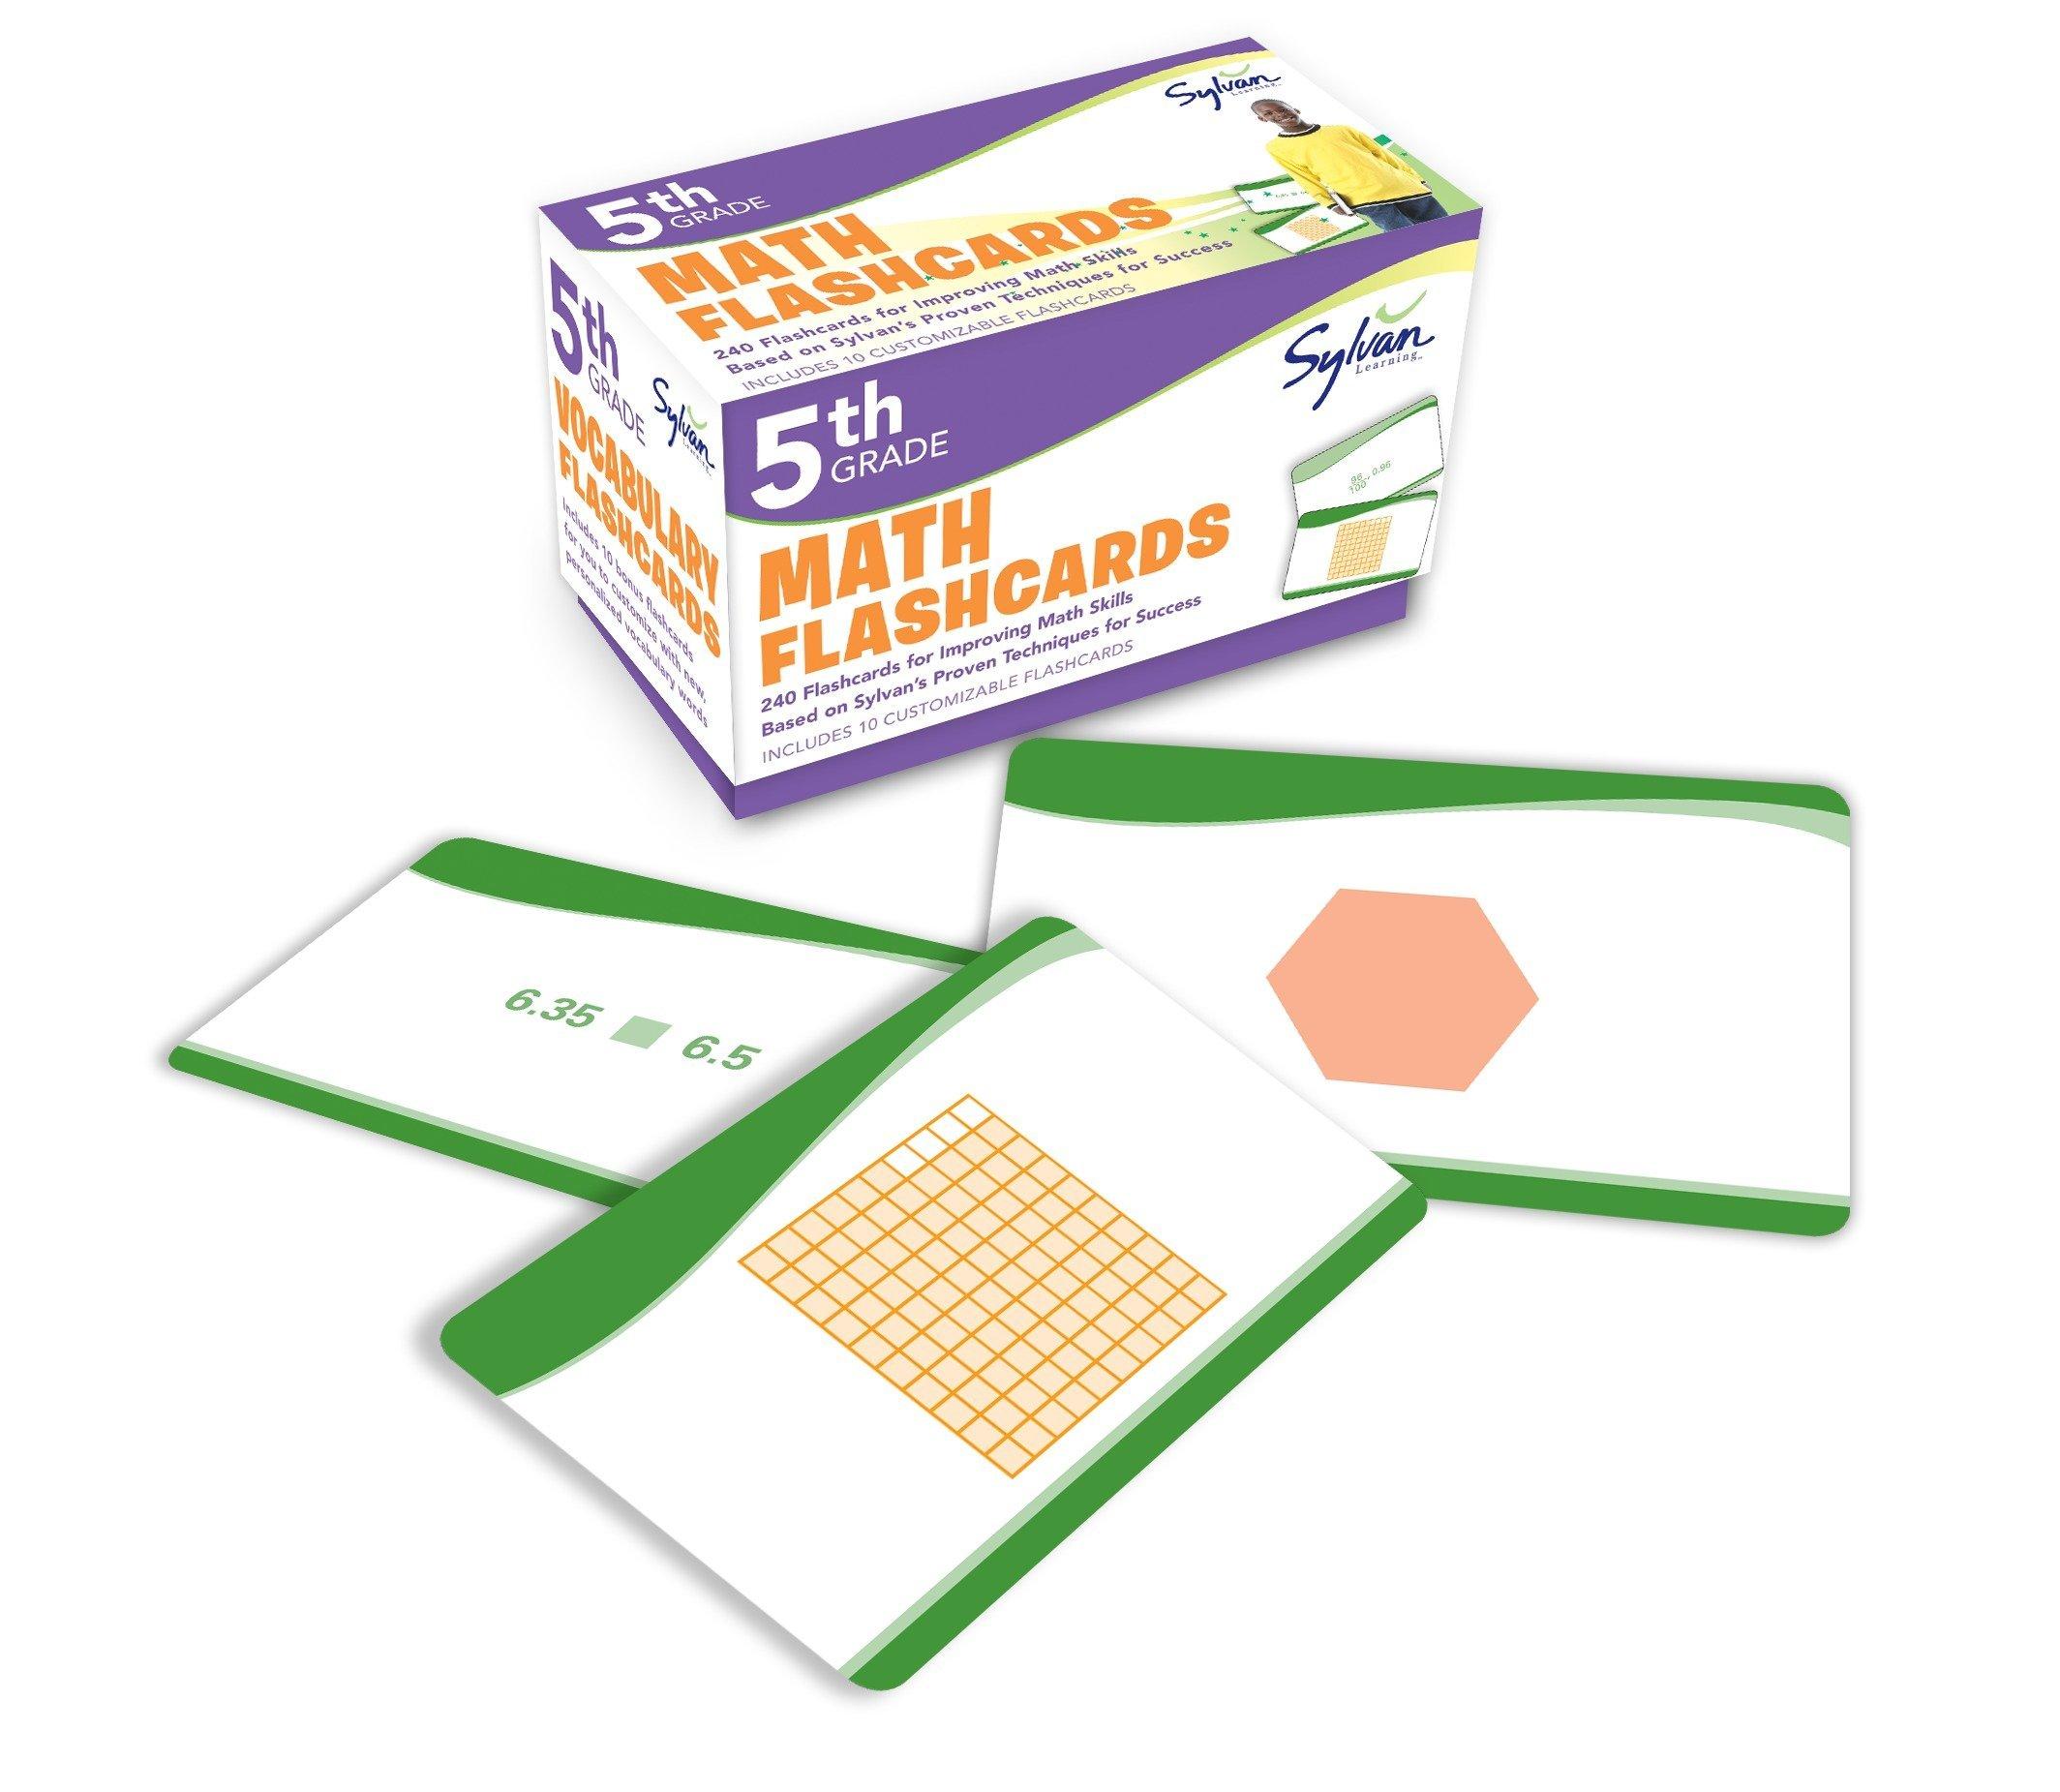 5th Grade Math Flashcards: 240 Flashcards for Improving Math Skills Based on Sylvan's Proven Techniques for Success (Sylvan Math Flashcards) pdf epub